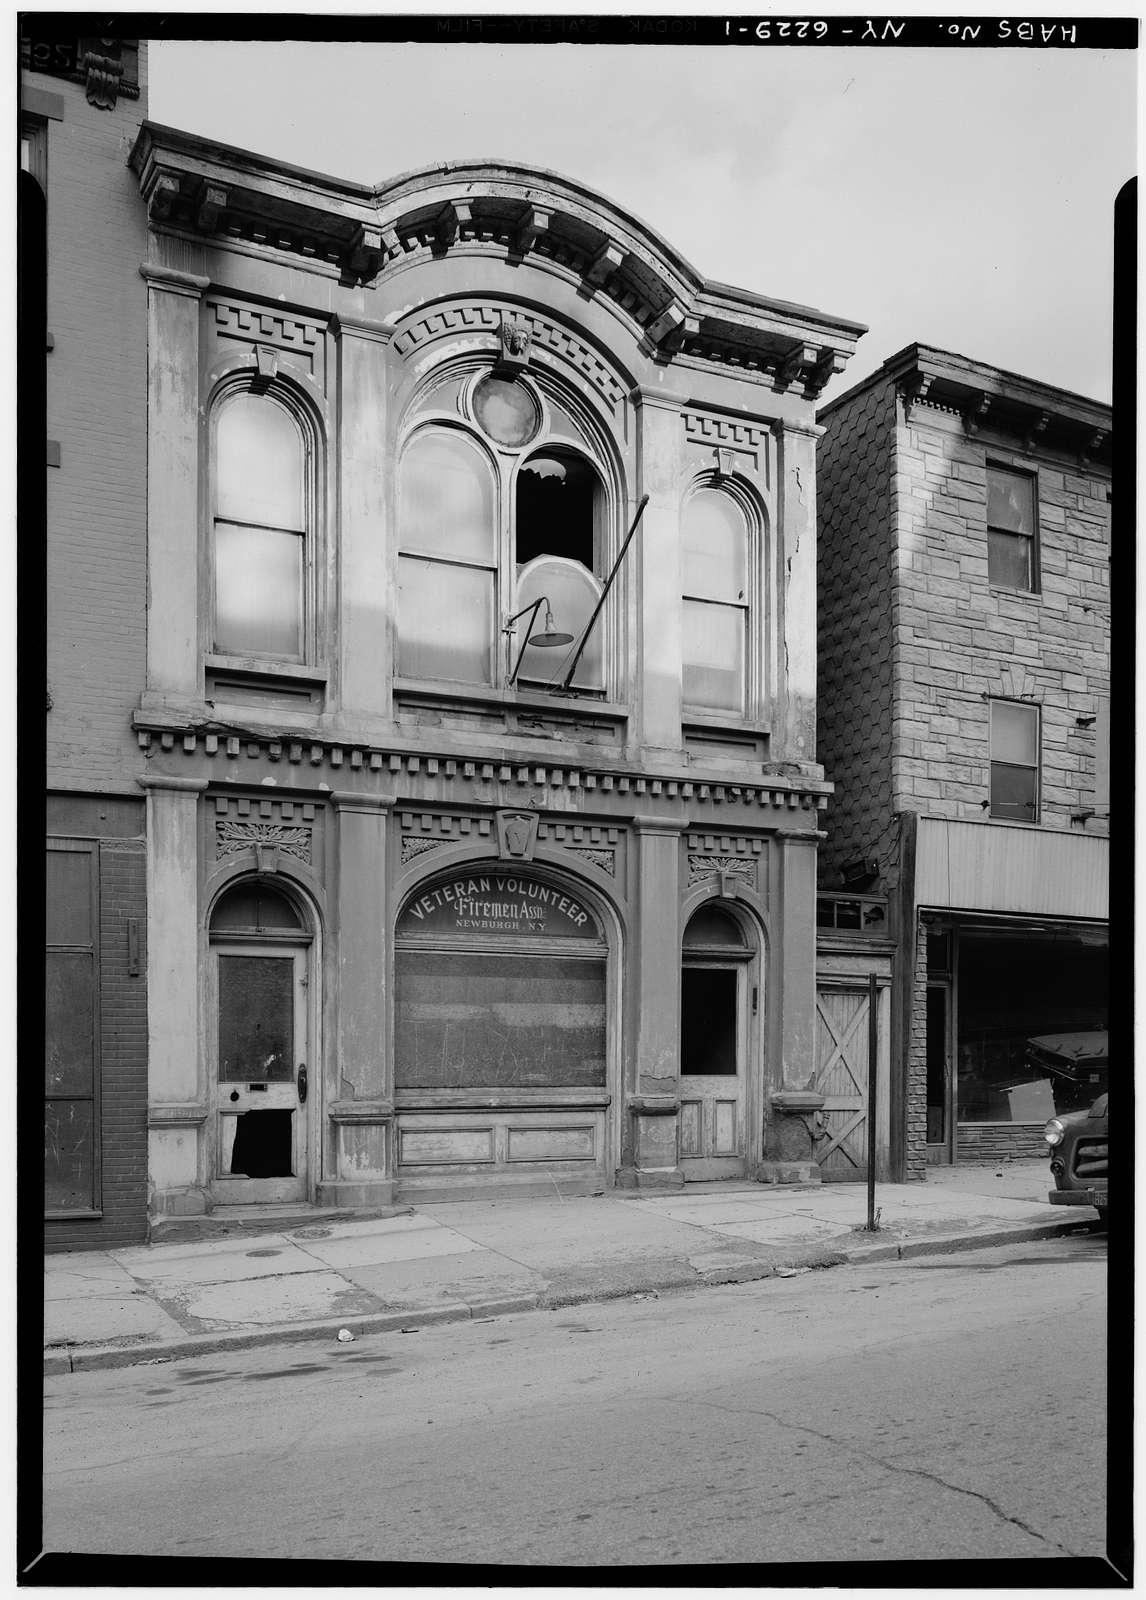 Ringgold Fire Company Firehouse, 63 Colden Street, Newburgh, Orange County, NY